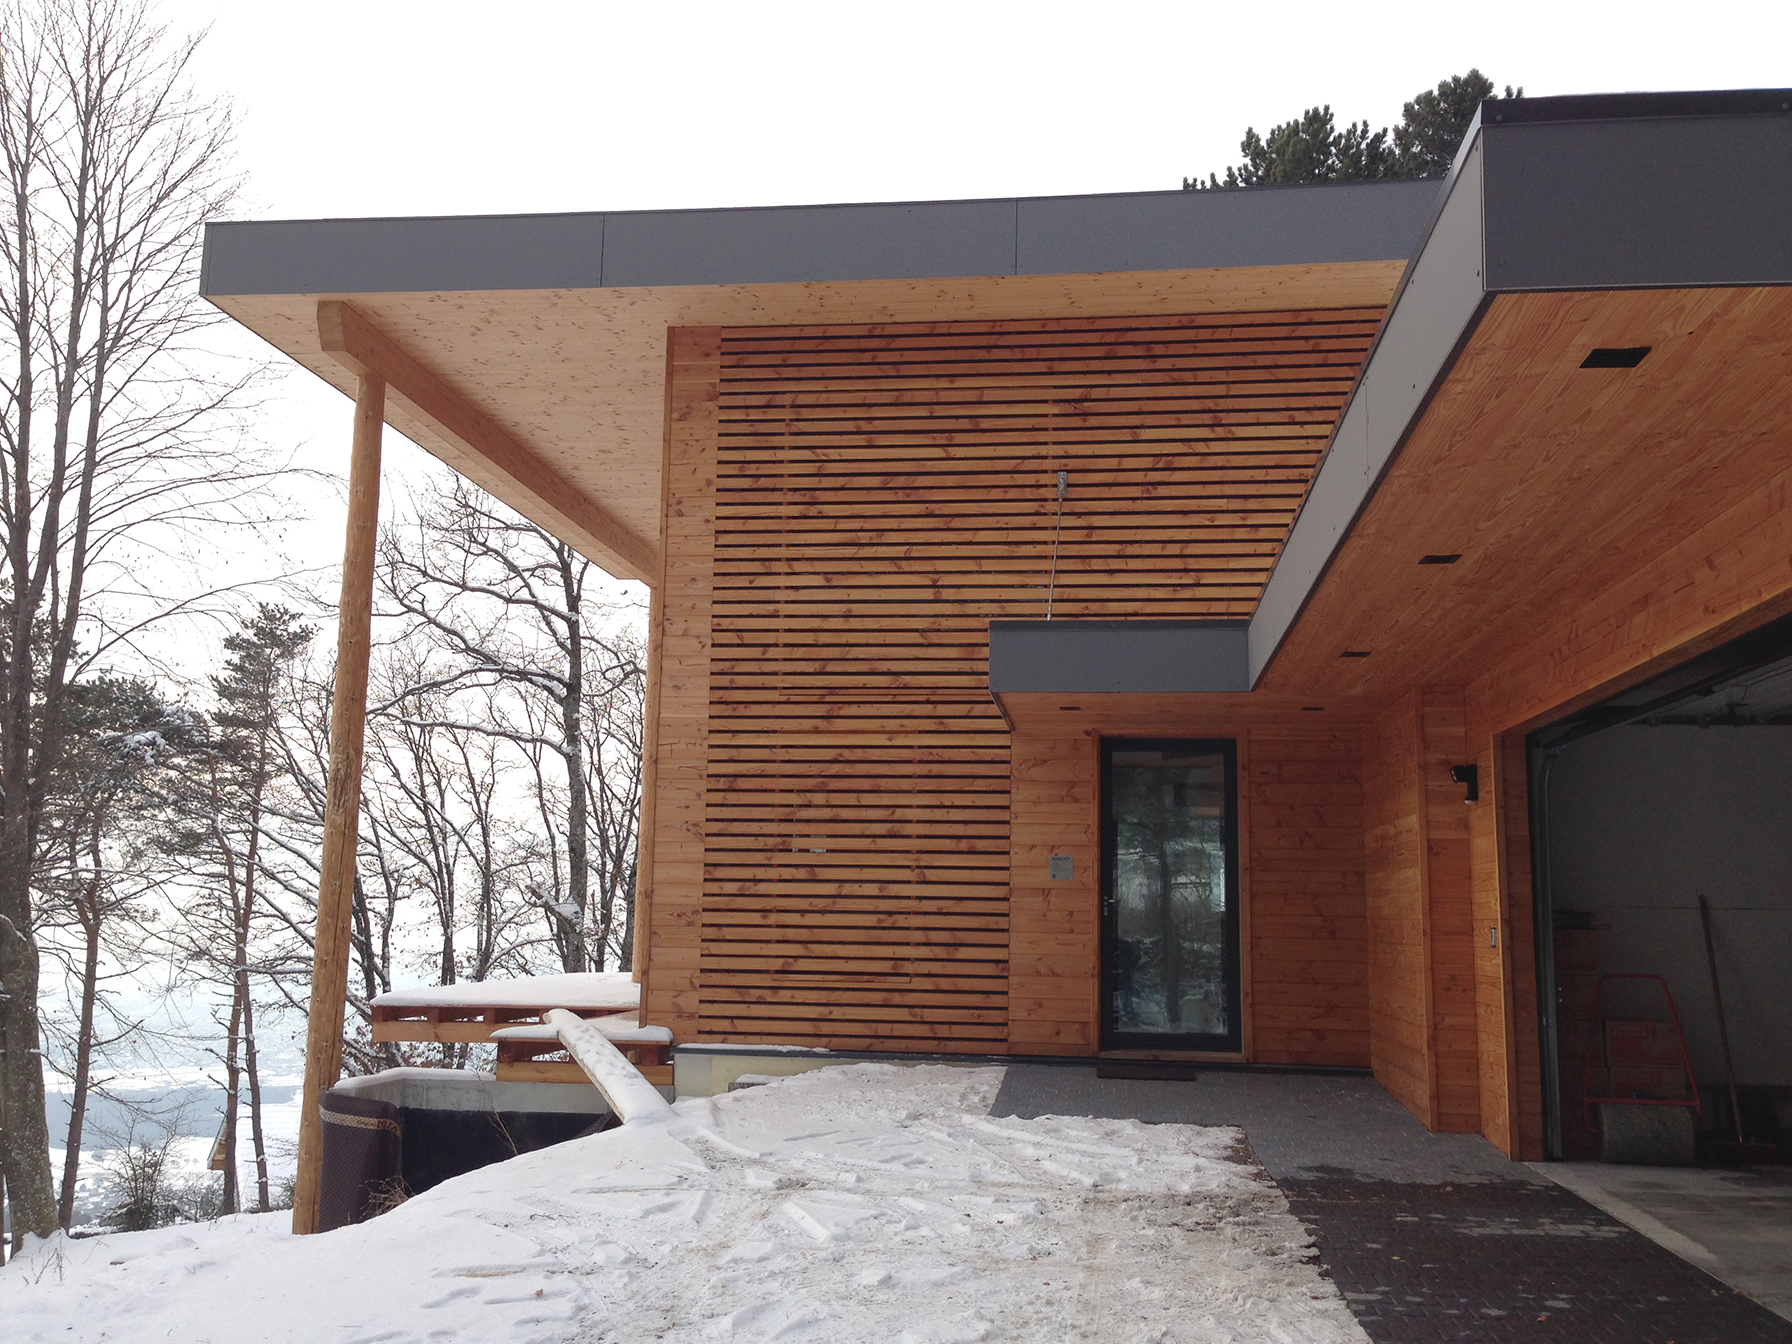 Maison Minergie - Architecte GUYOT Nelly